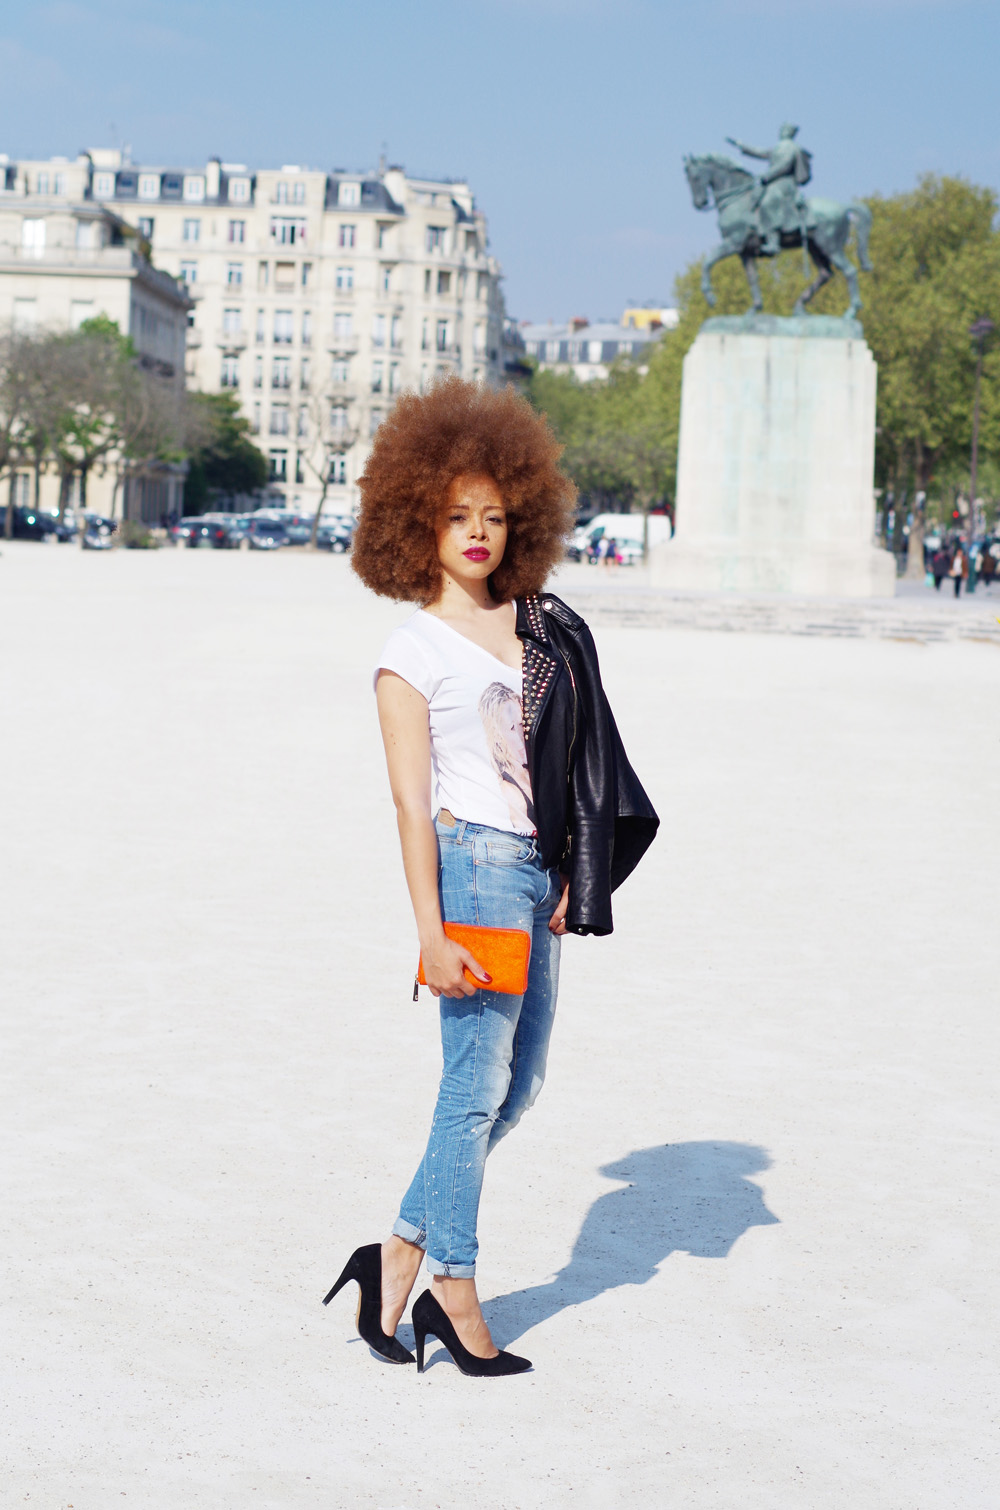 fatimayarie-afro-redhair-freckles-fashionblog-leatherjacket-jeans-asos-imgp9224